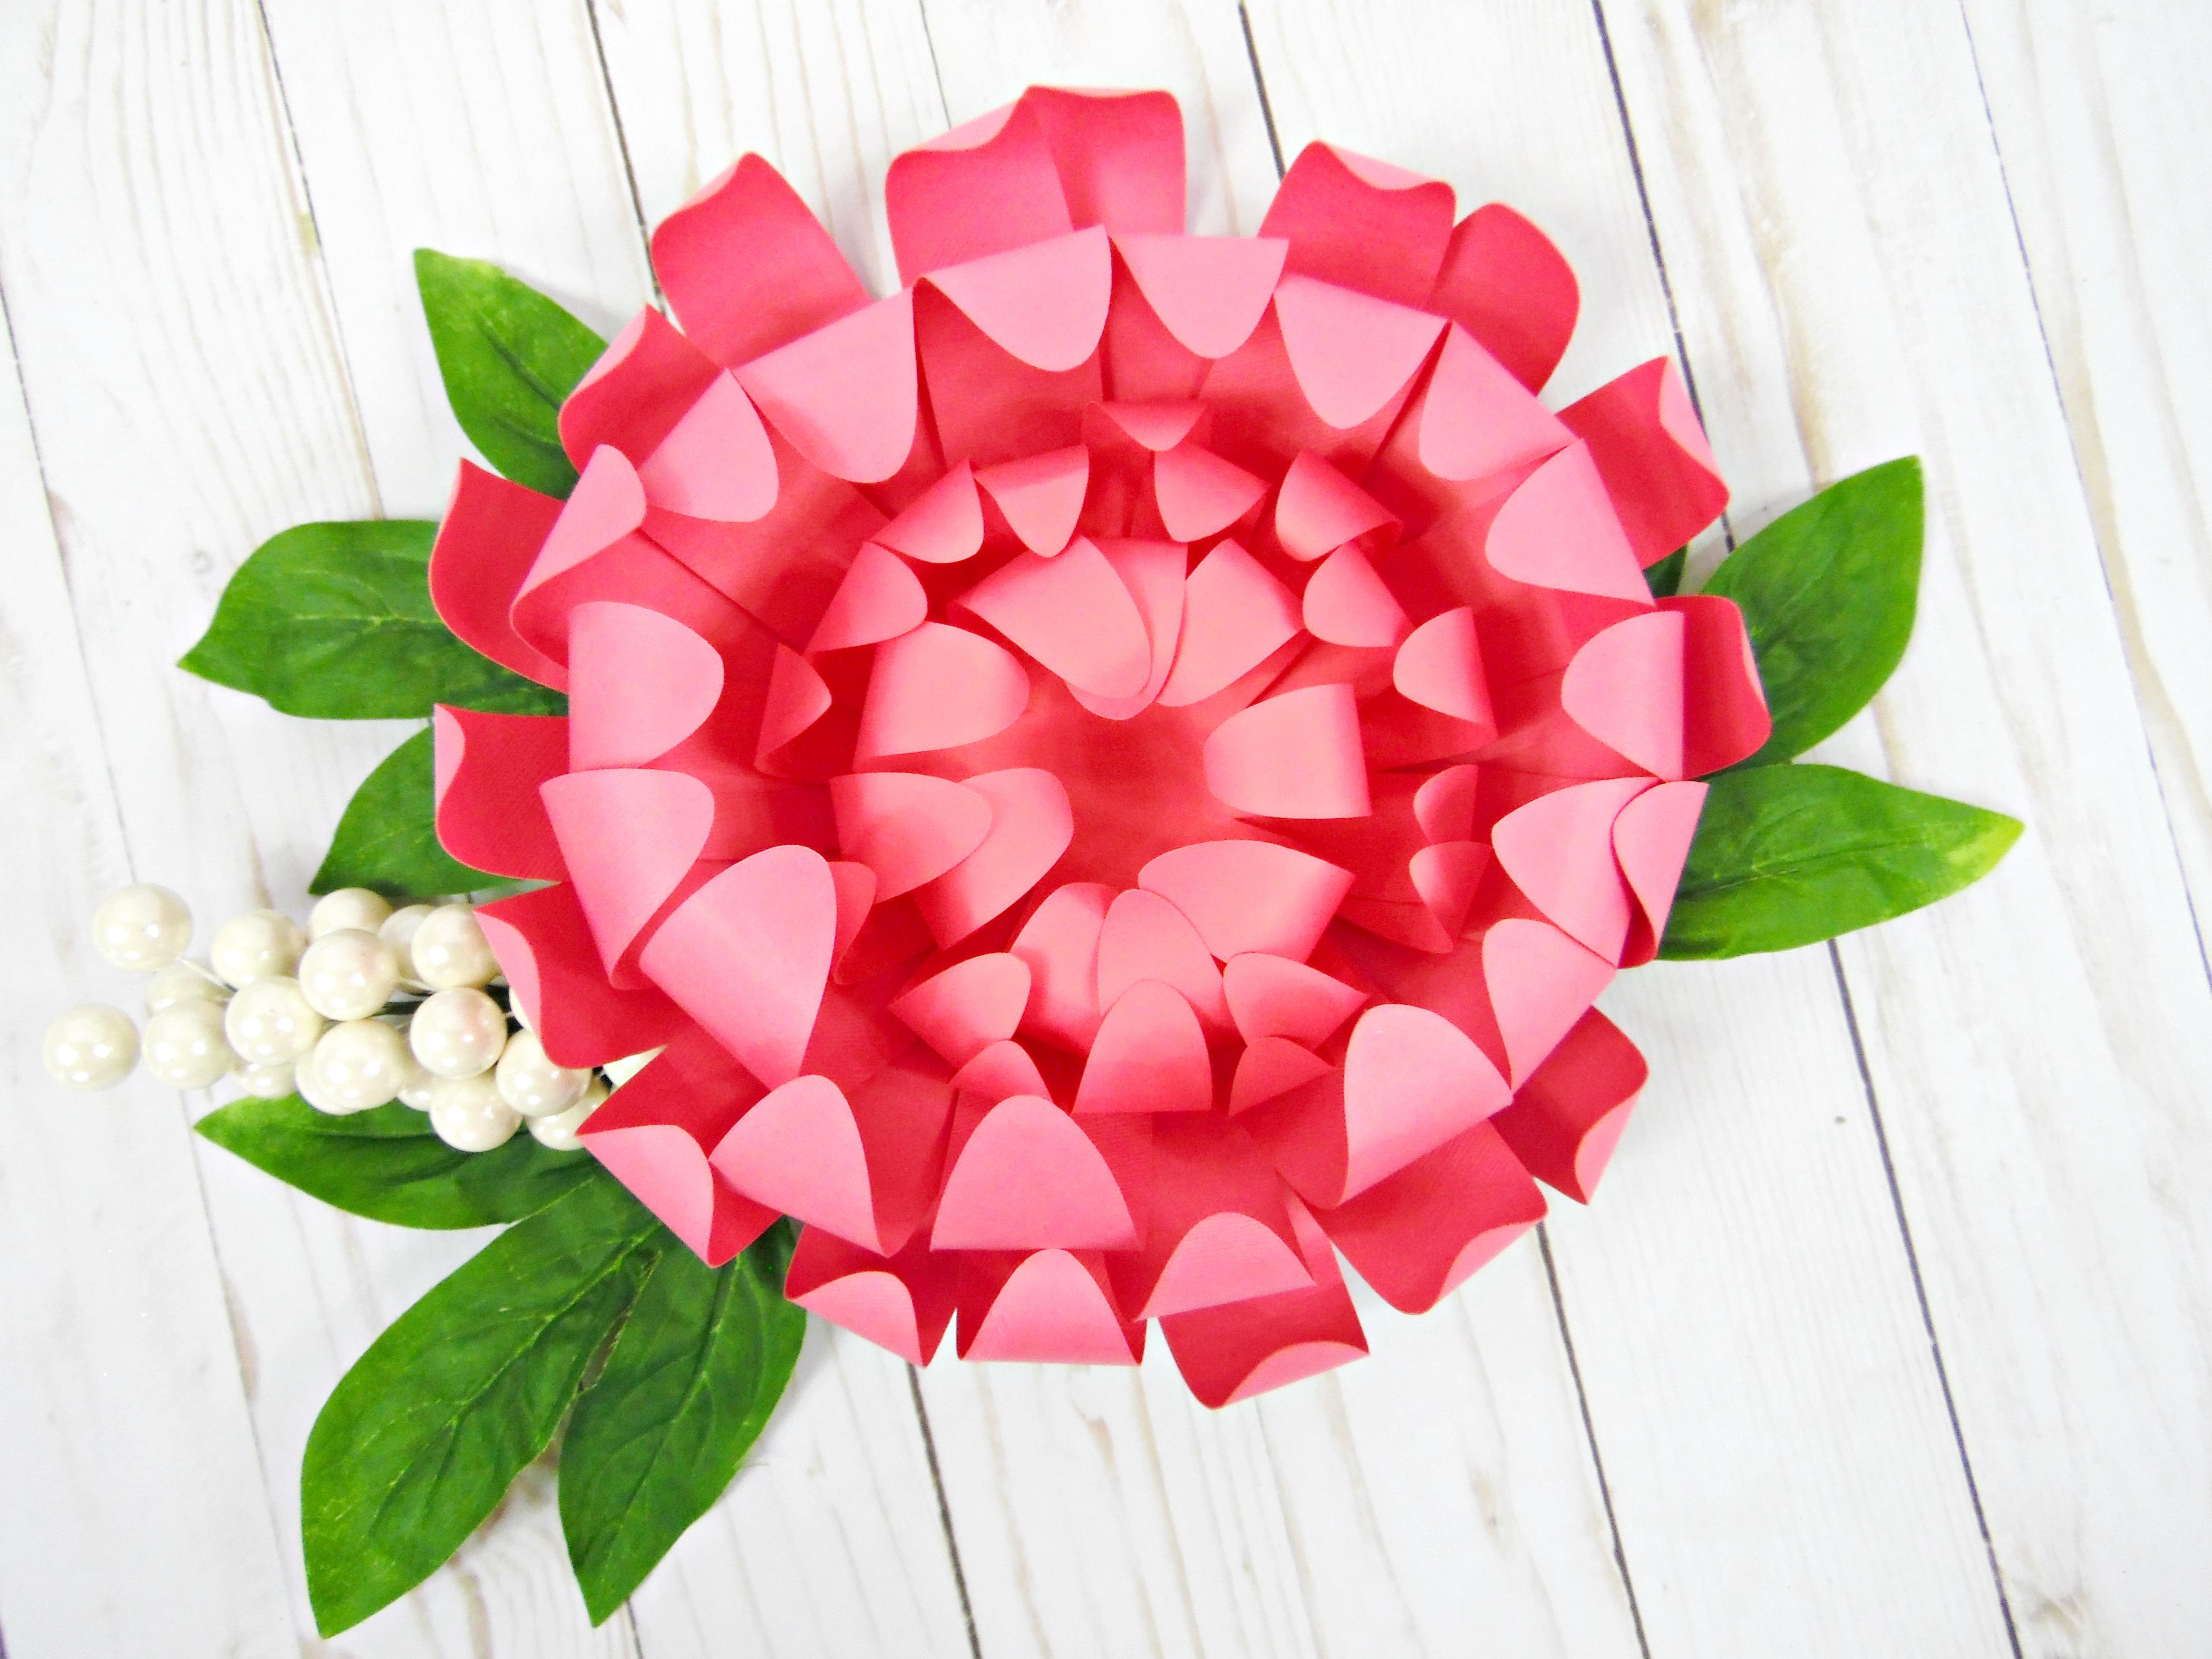 DIY Chrysanthemum Flower Tutorial Paper Craft Project